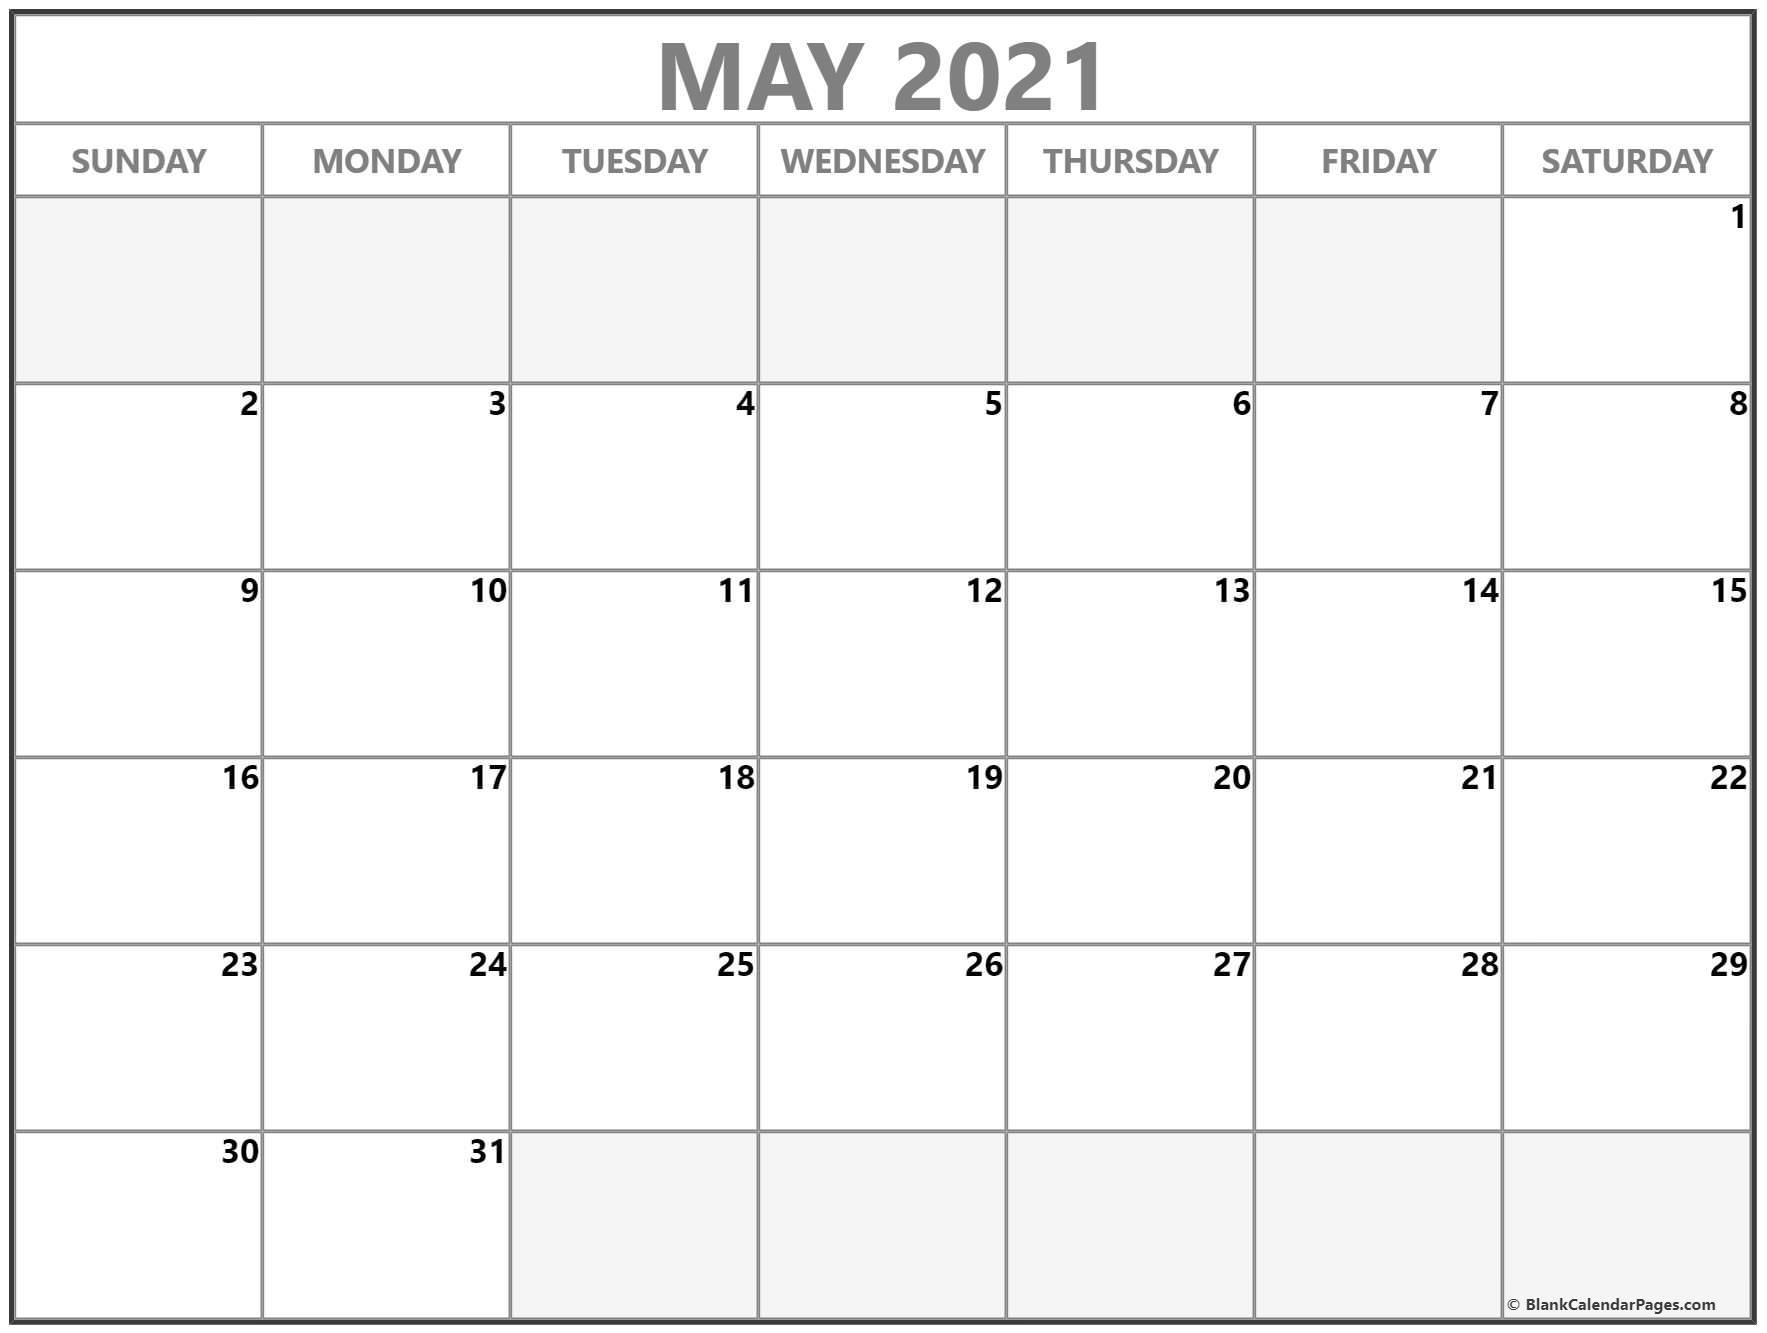 May 2021 Calendar | Free Printable Calendar Templates within Blank Monthly Calendar 2021